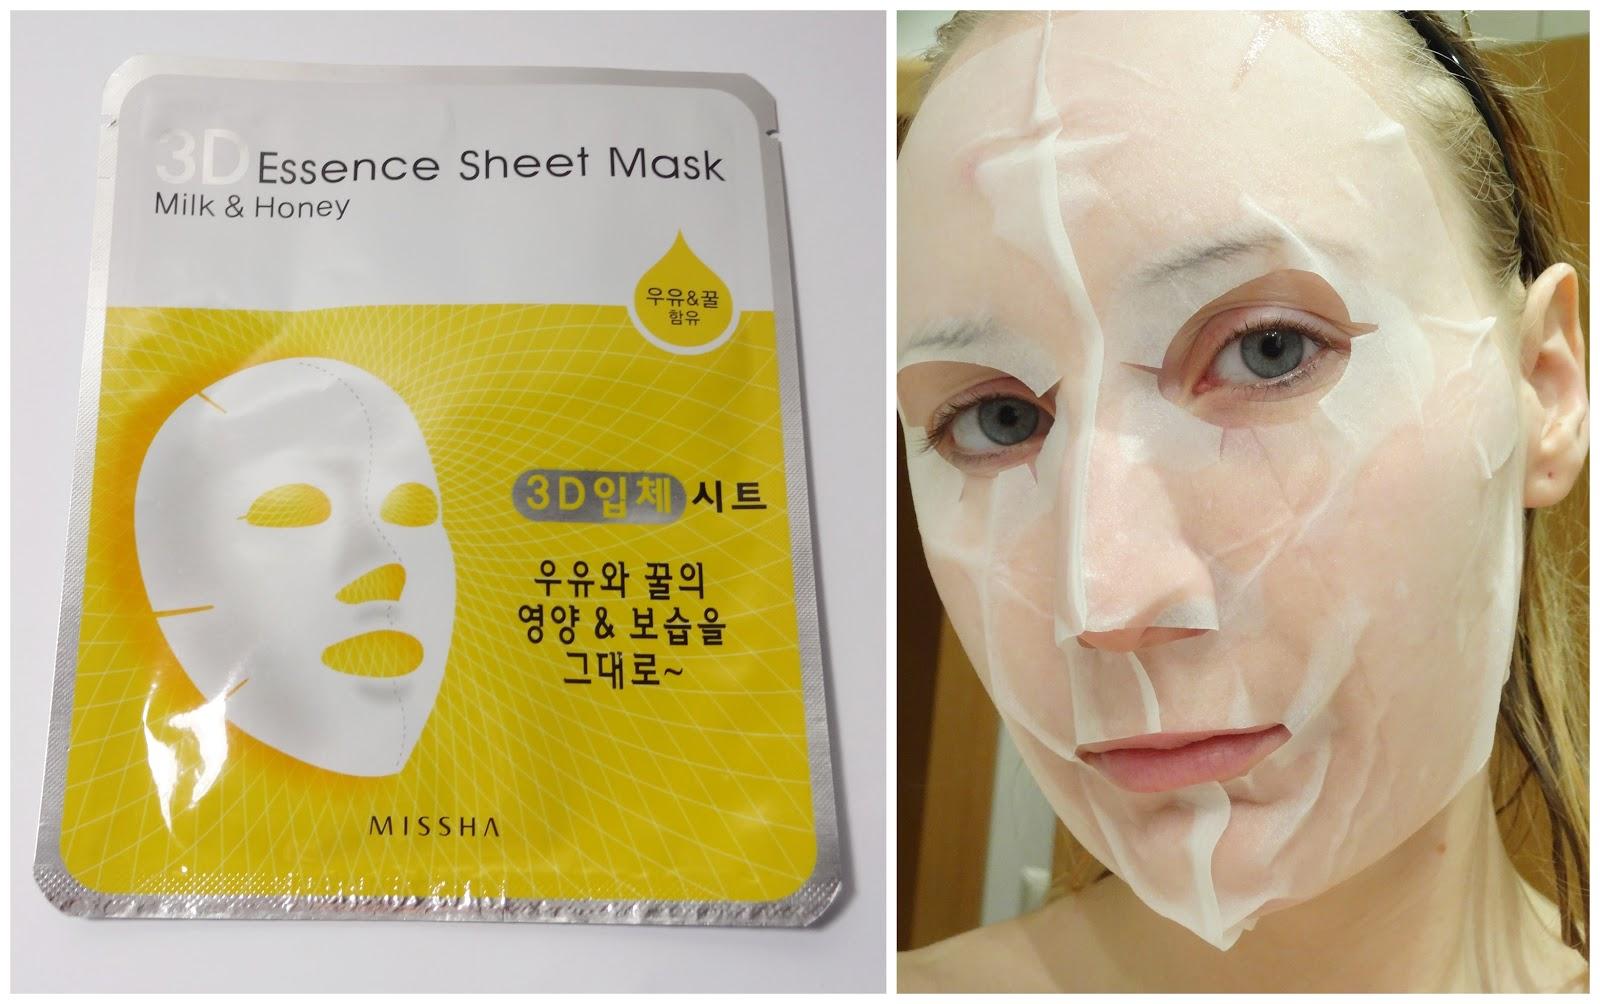 Missha - 3D Essence Sheet Mask (Milk & Honey)